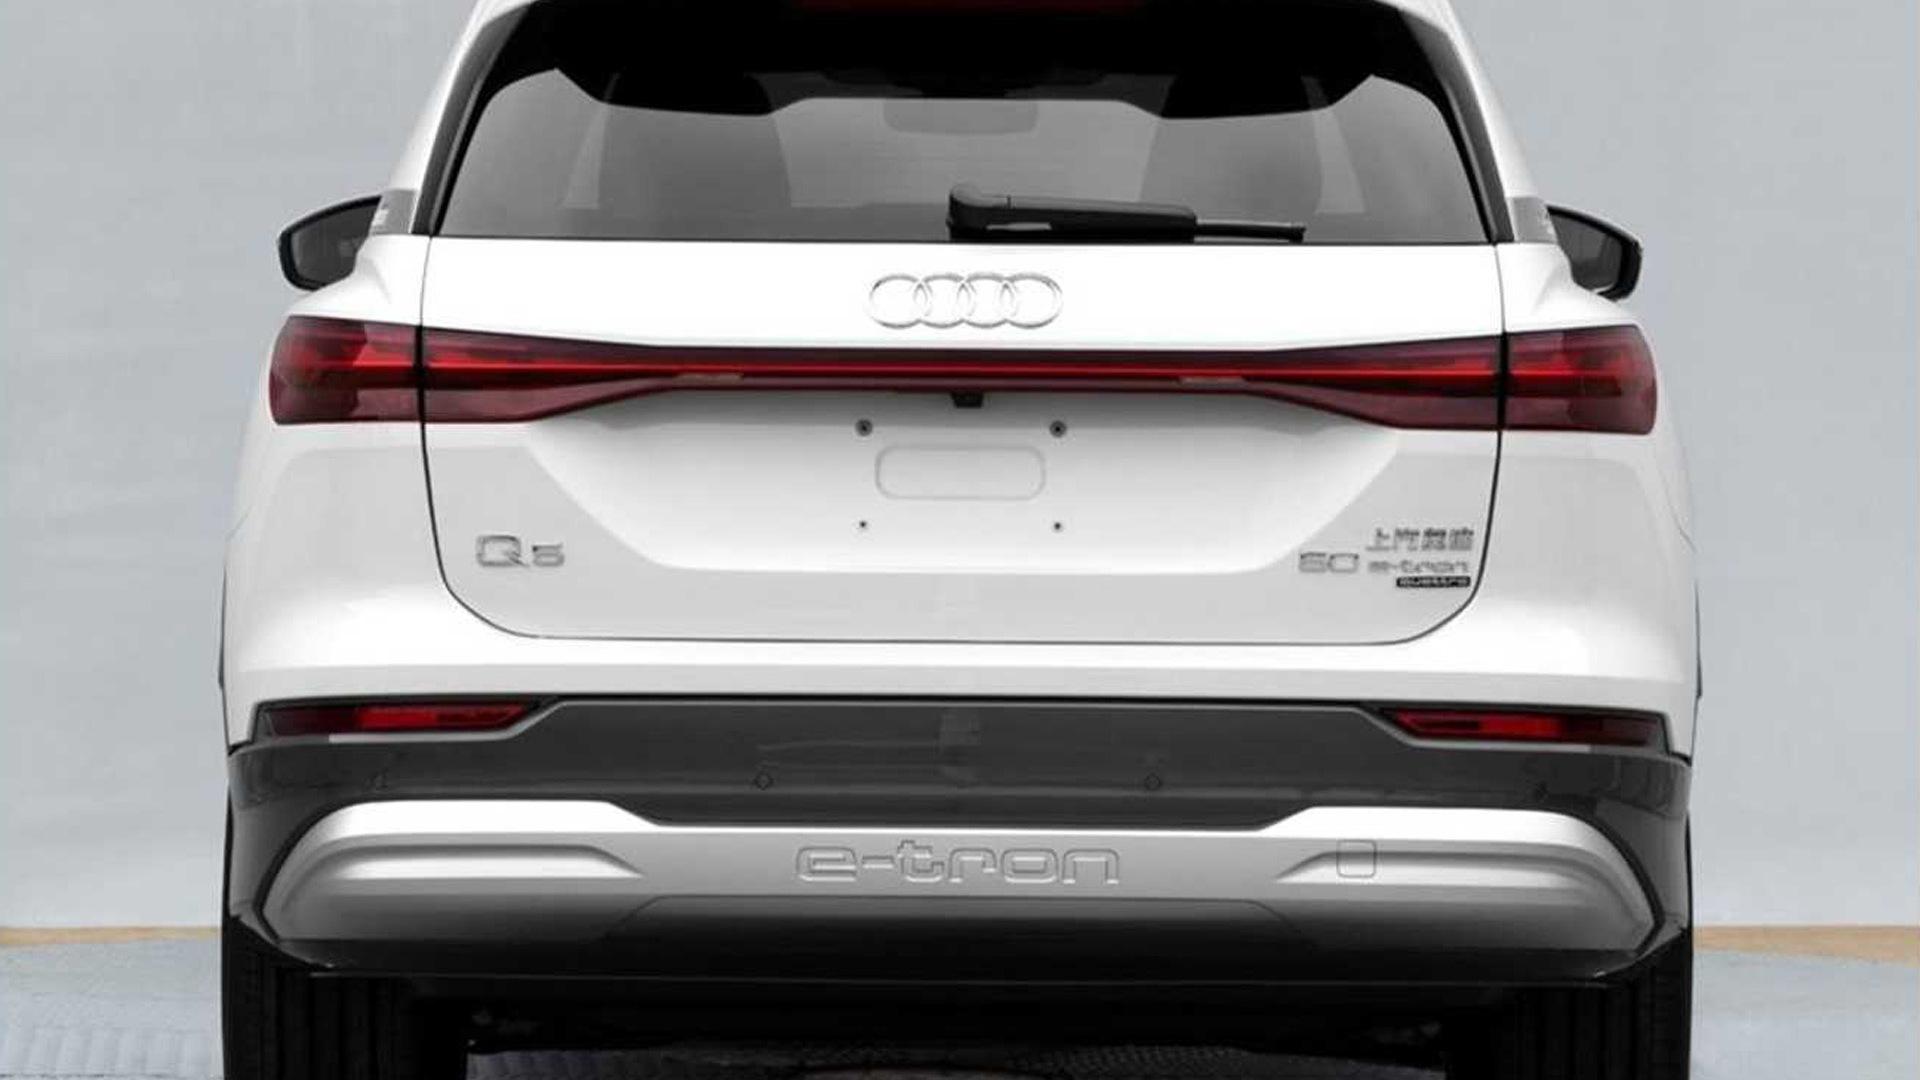 2022 Audi Q5 E-Tron - Photo credit: Autohome